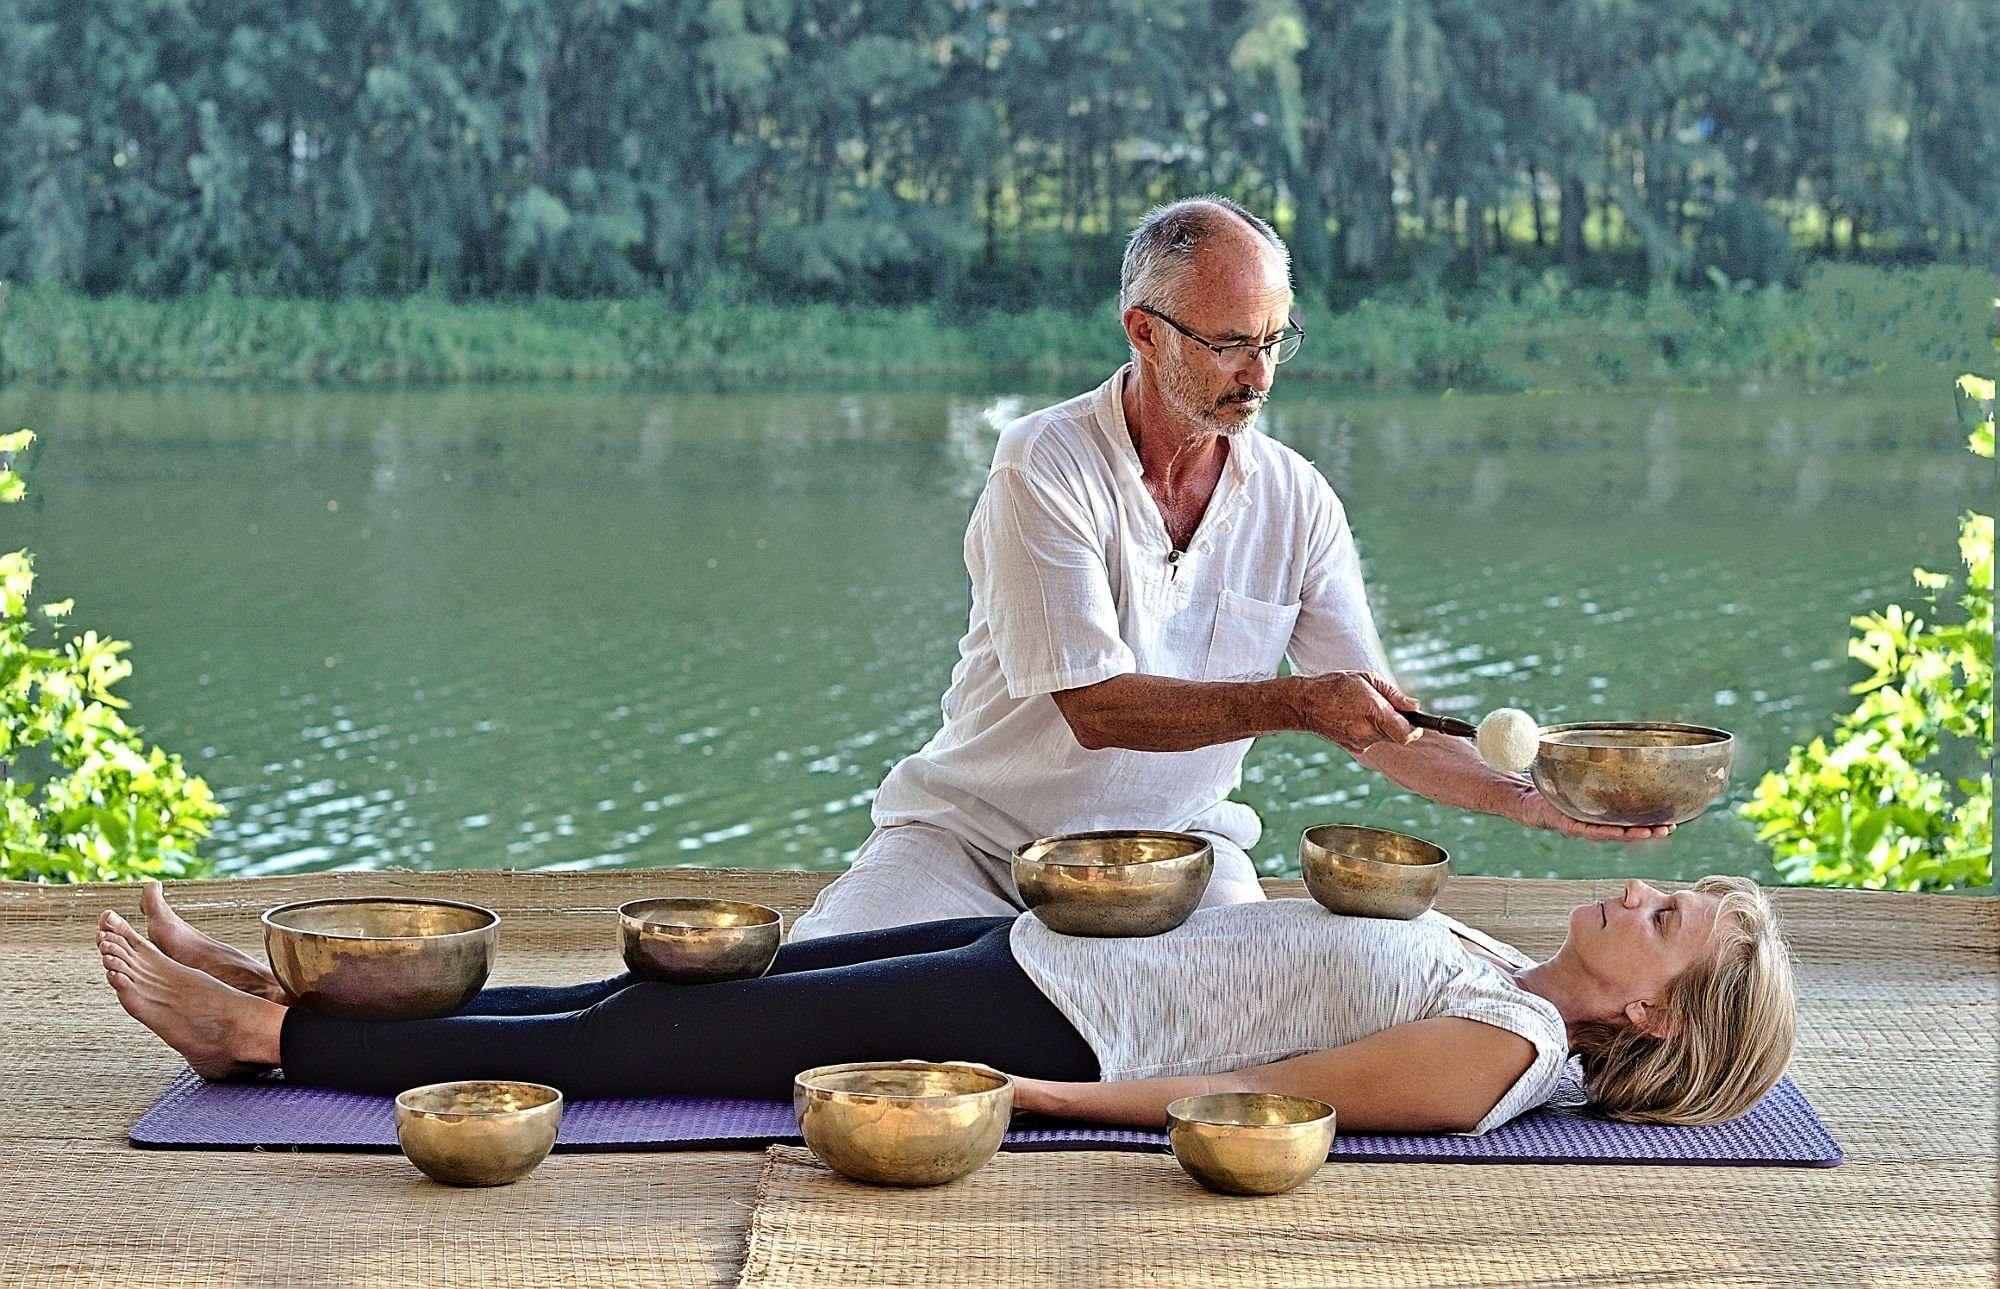 Meditation Retreat Vietnam - Write Your Journey: Nigel Rowles gives Kerstin Pilz a relaxing sound bowl treatment